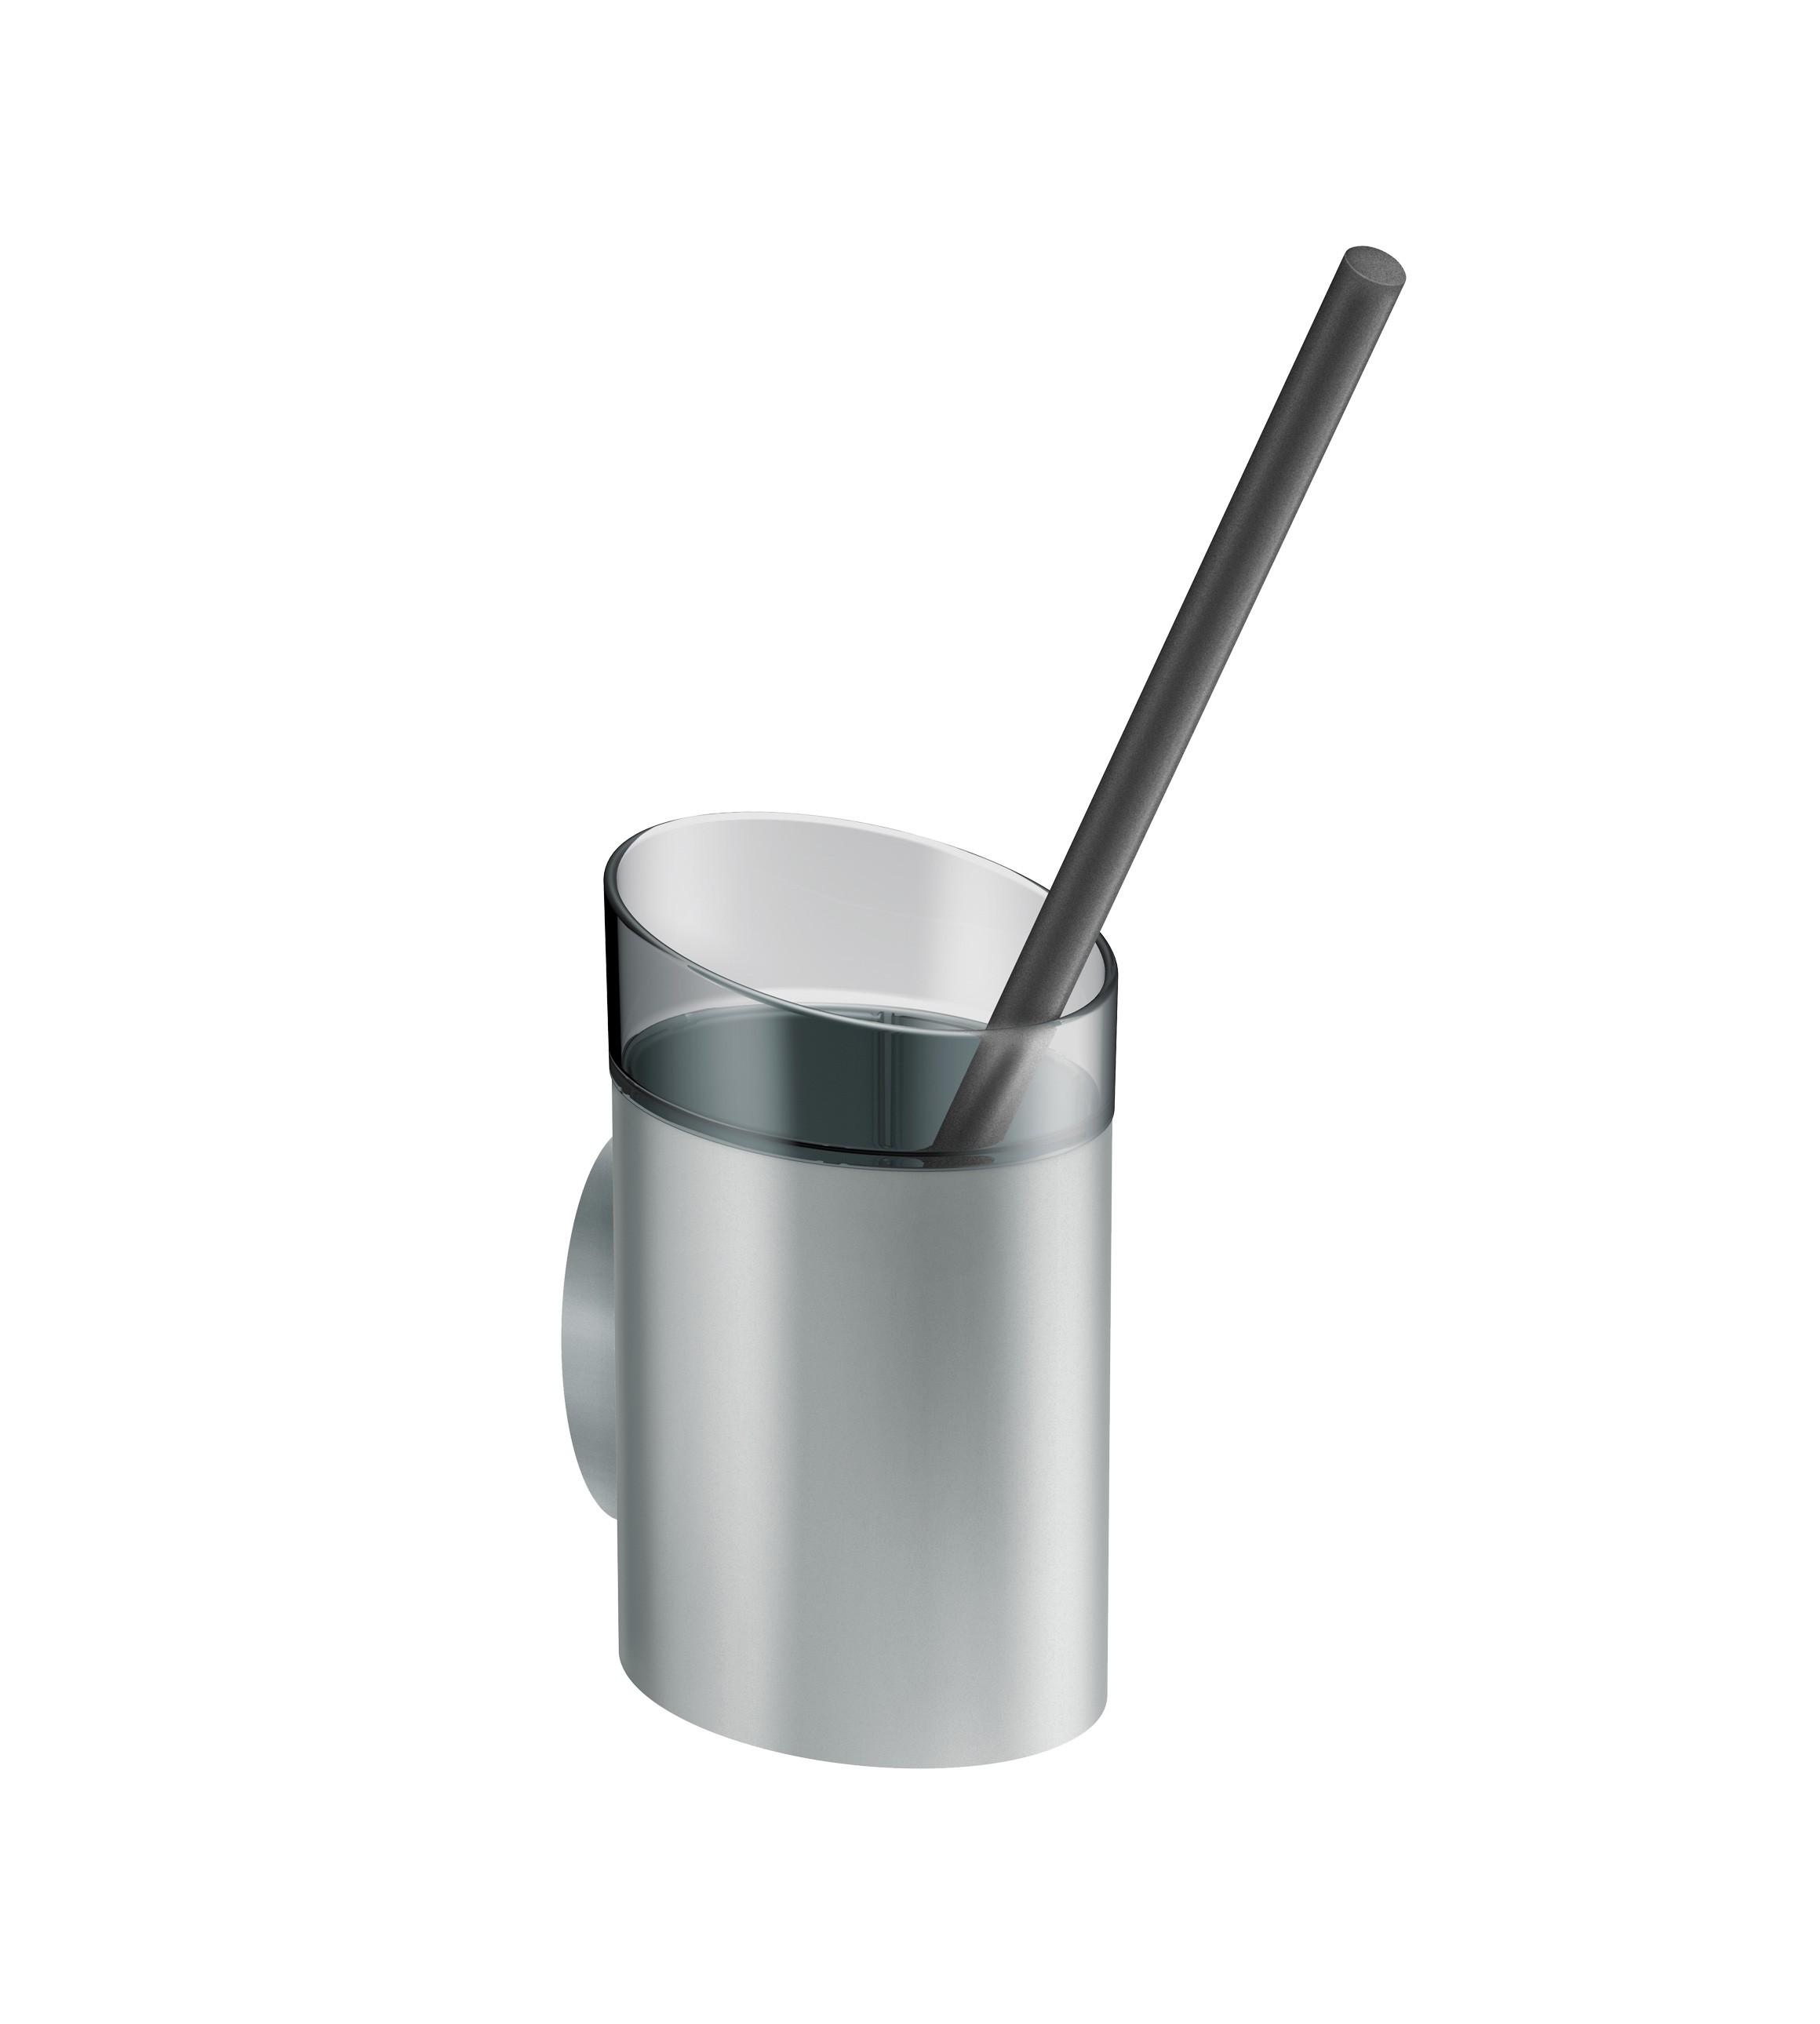 FSB WC-Bürstengarnitur A100 Stützen Aluminiumgrau metallinksc Stange Anthrazitgrau metallinksc (0 82 8460 00008 8811)